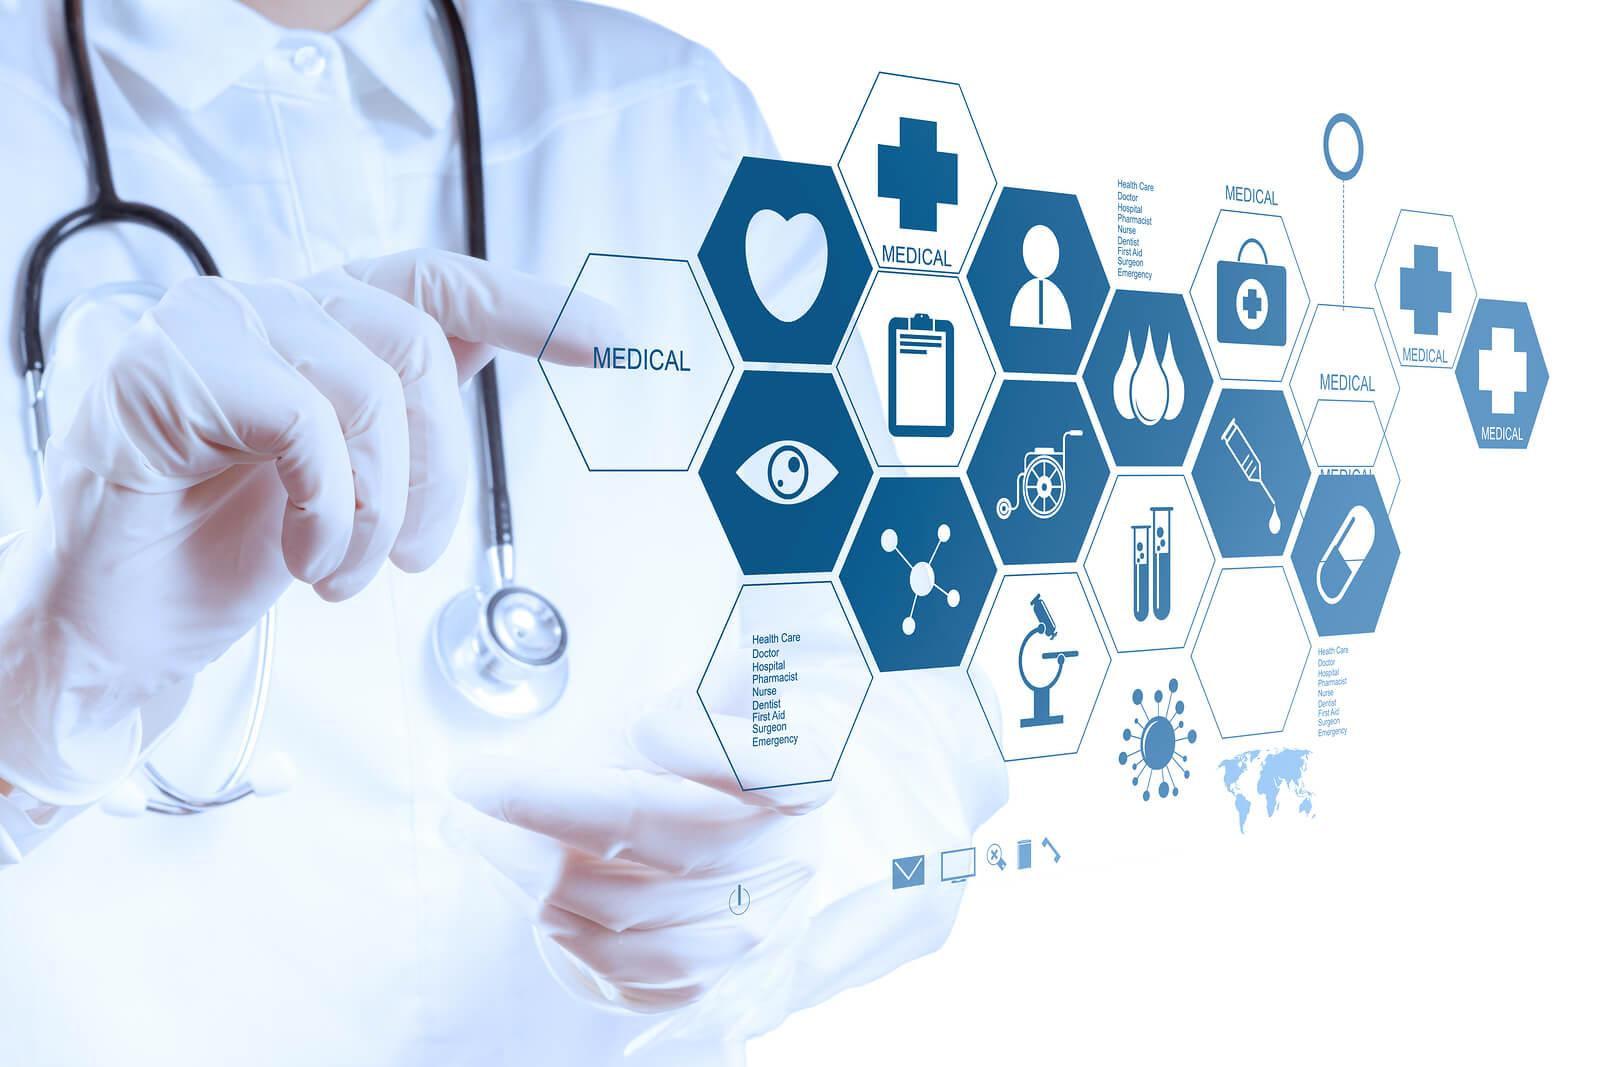 AI Transforms Healthcare in Africa - MIIAfrica